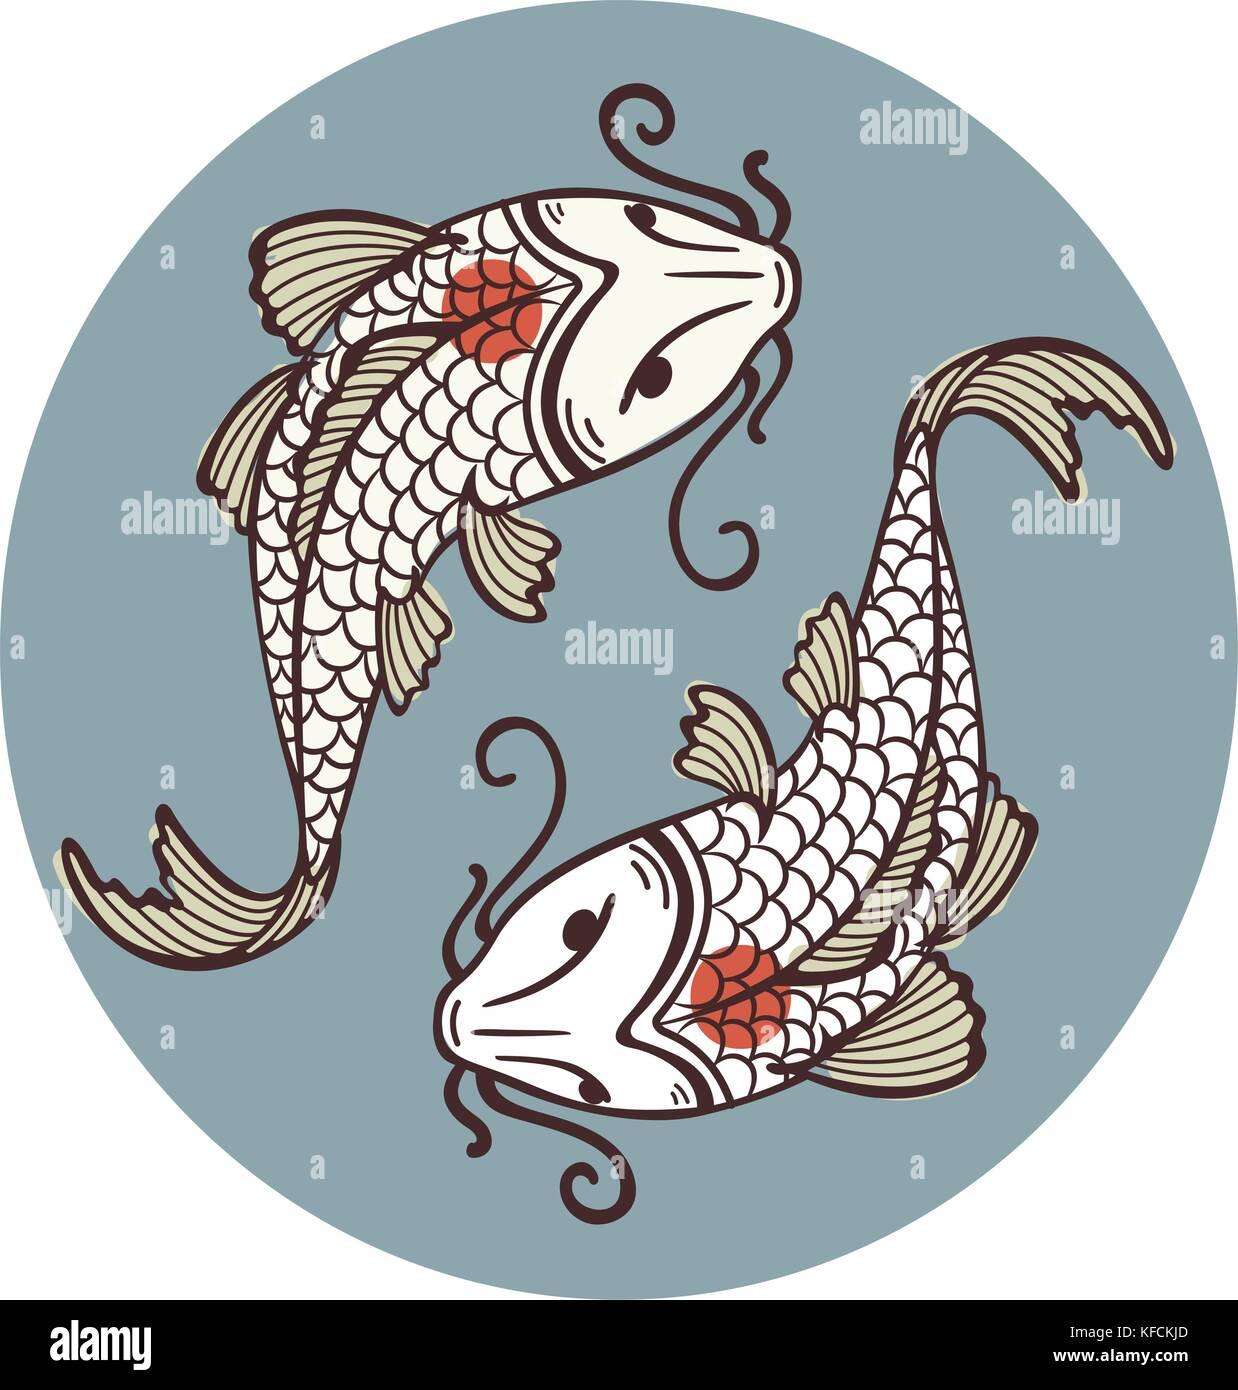 Koi carp tattoo stock photos koi carp tattoo stock for Koi fish representation